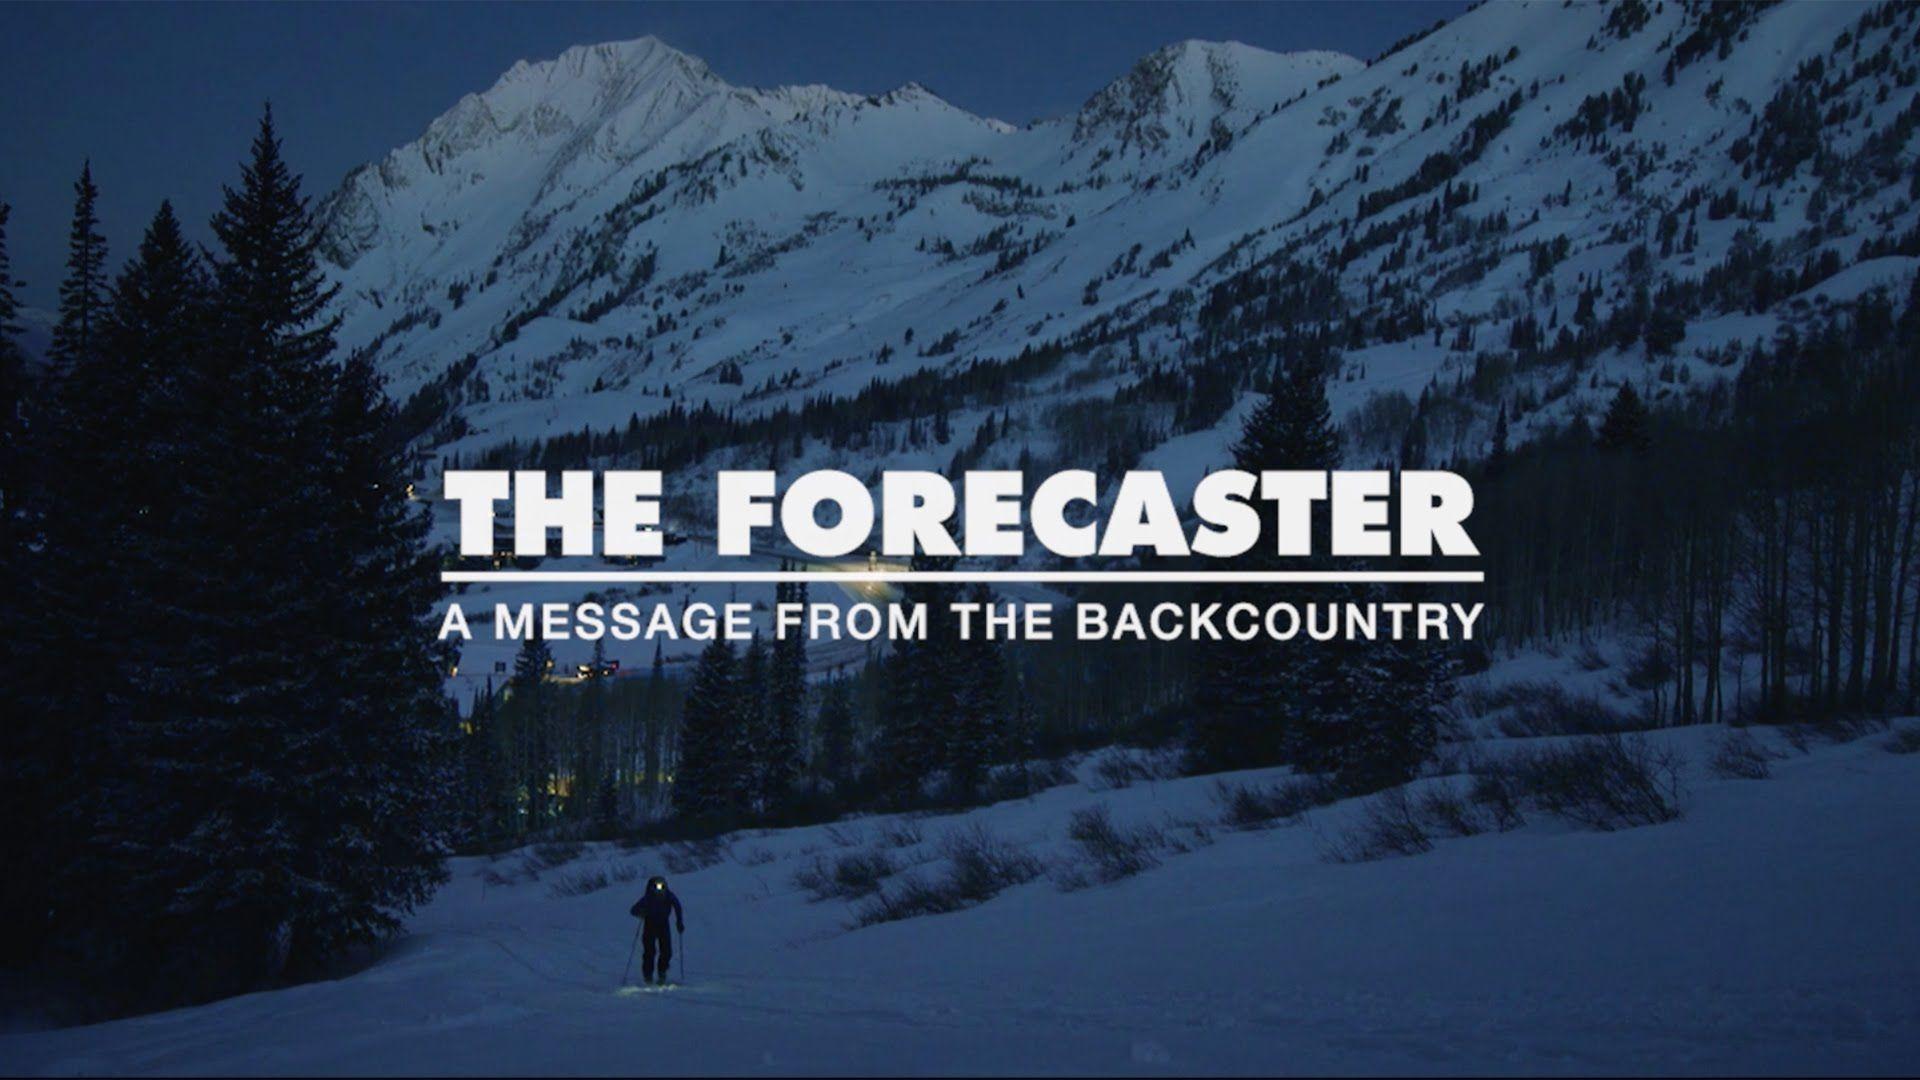 Black Diamond Bdtv S1 Episode 2 The Forecaster Backcountry Skiing Backcountry Skiing Utah Skiing Skiing